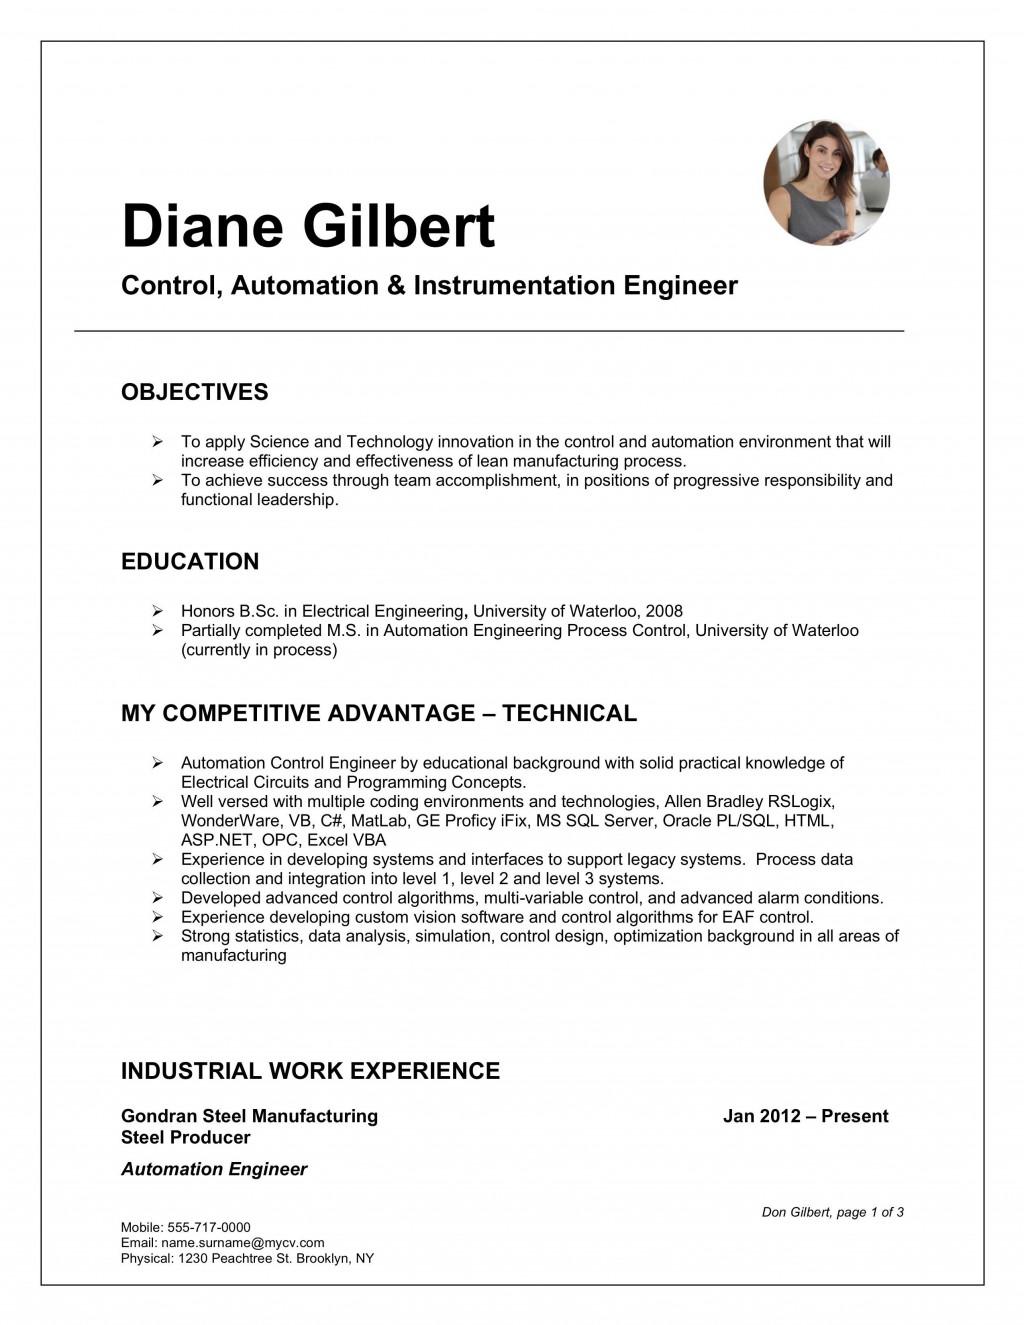 002 Shocking Skill Based Resume Template Word Picture  MicrosoftLarge